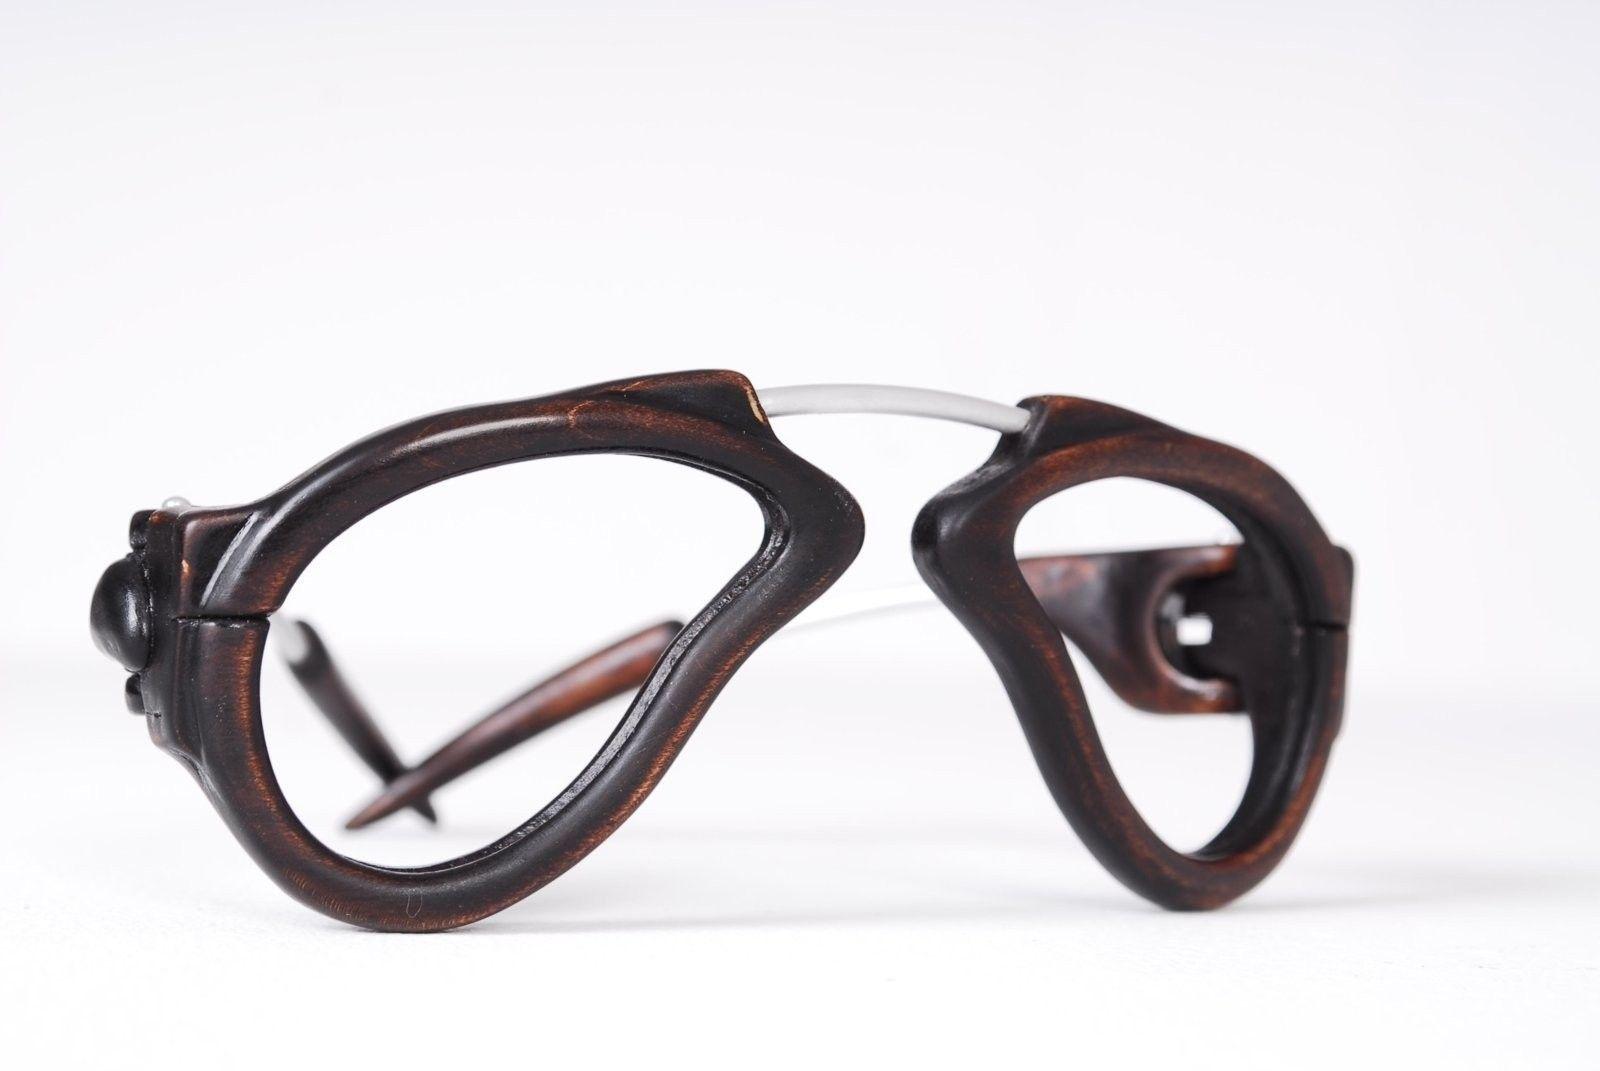 Spectacular Handmade Wooden Sunglasses - 2016-05 Jaromir Wire Dali 12.JPG